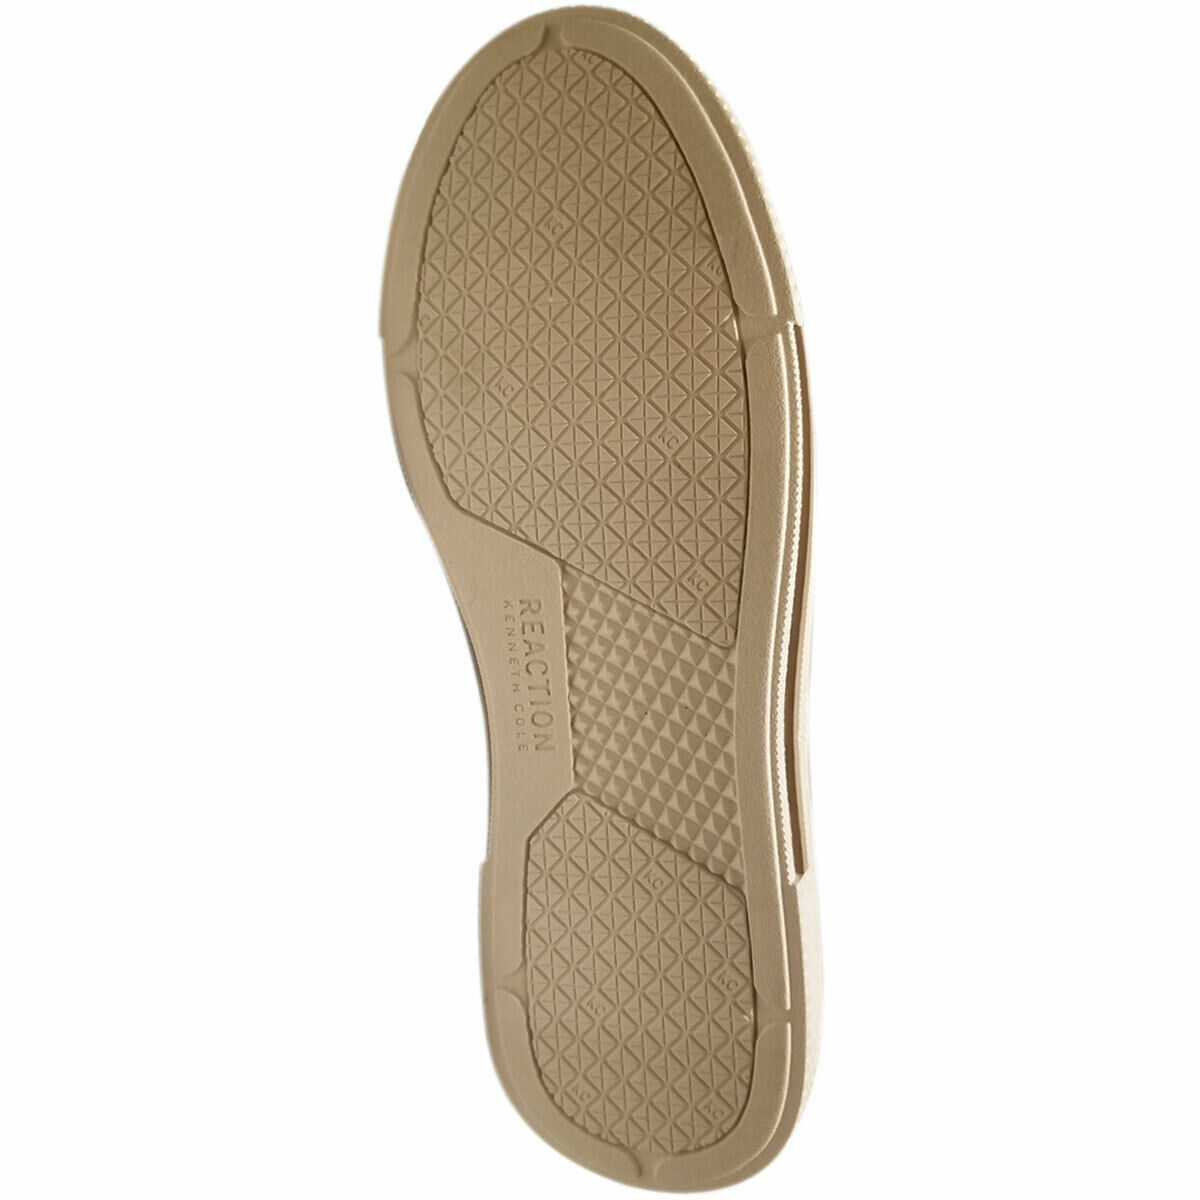 Kenneth Cole Reaction Men's Ankir Canvas Slip-on Boat Shoes Beige Sand 9.5 M ... image 4